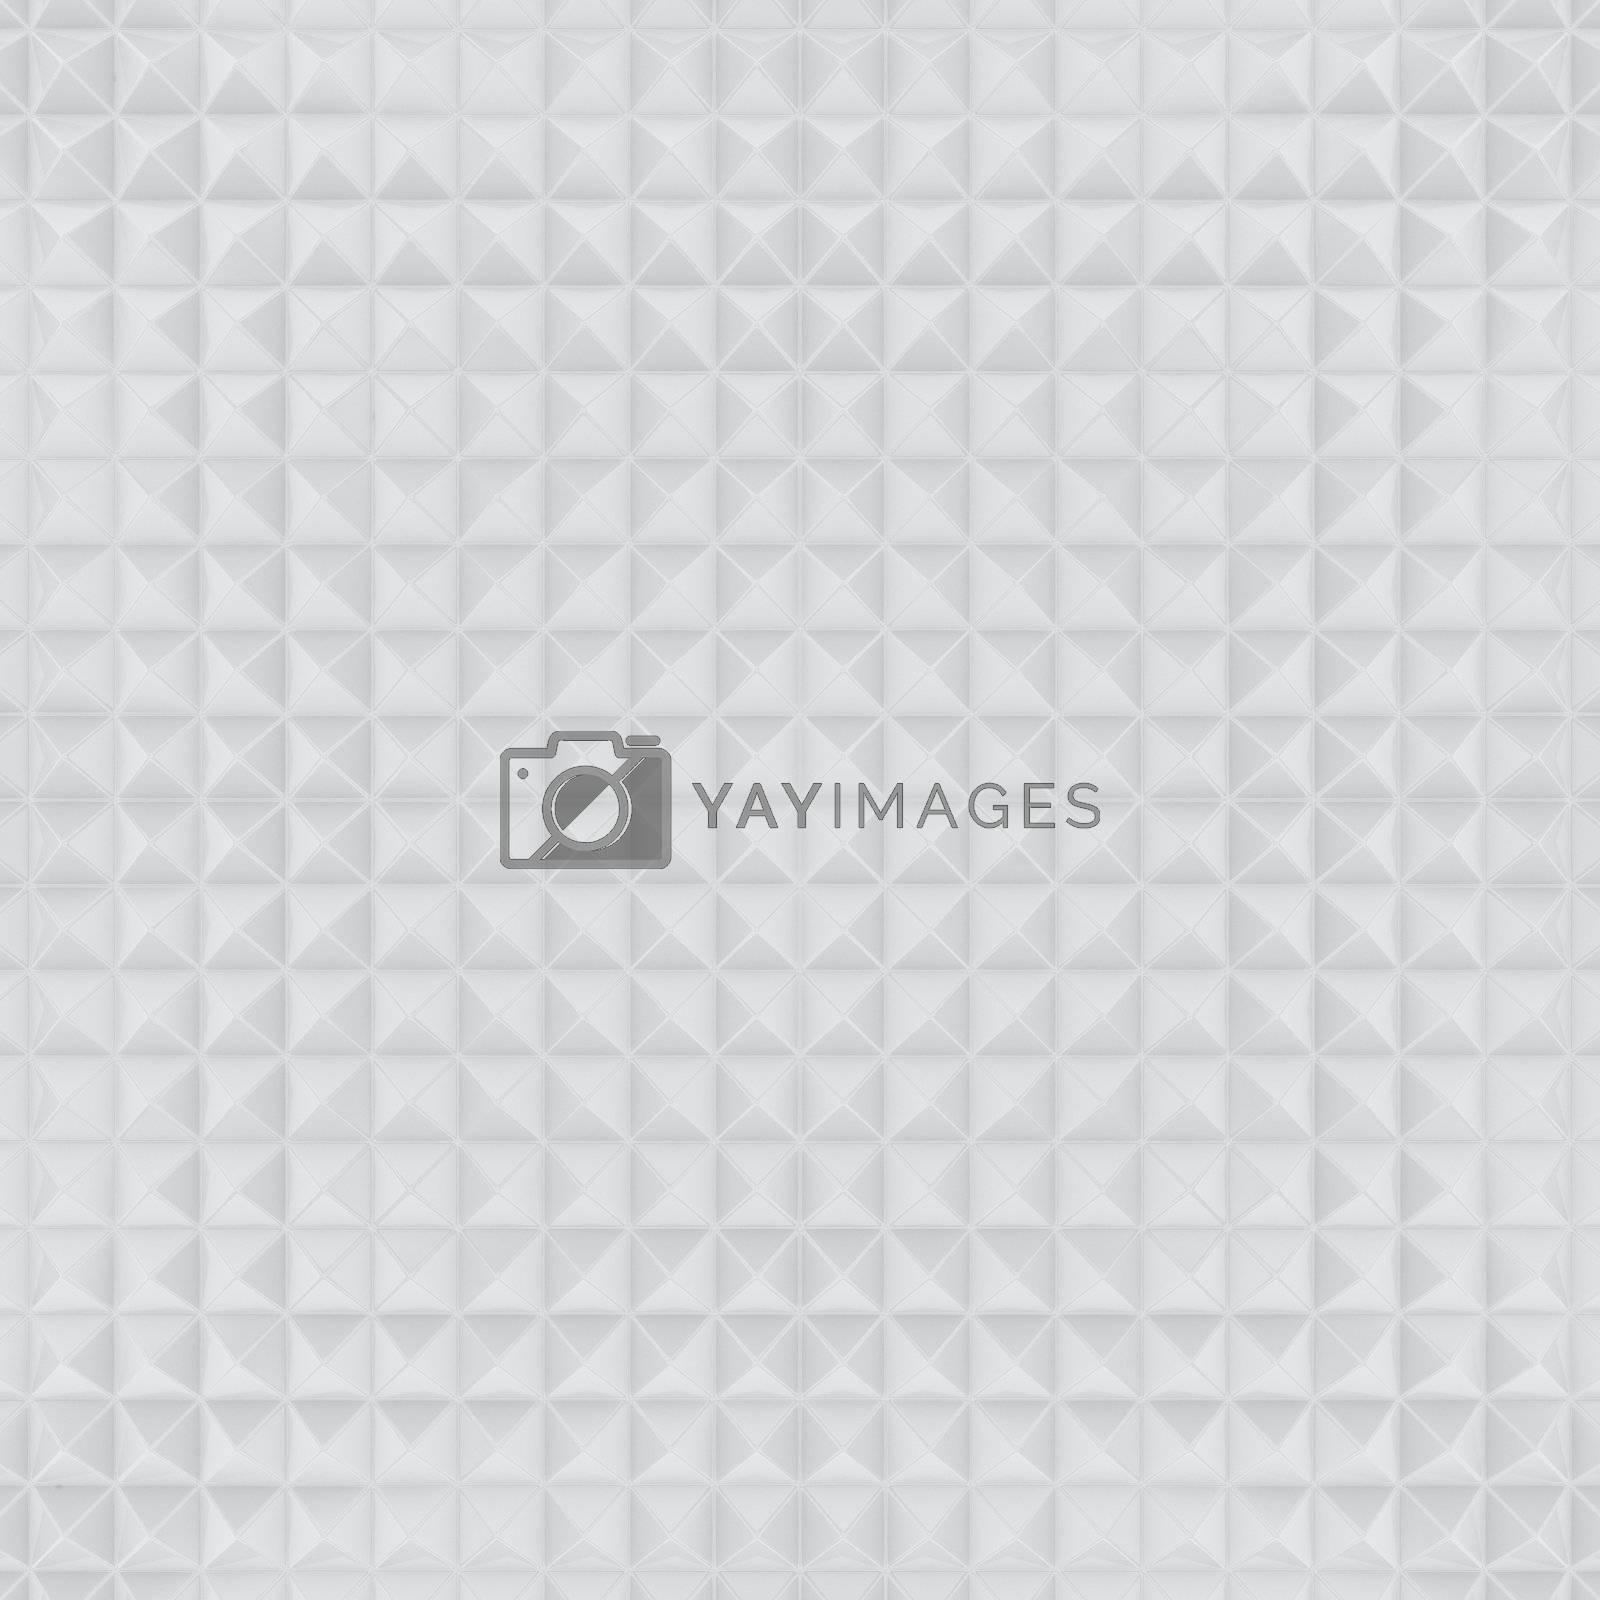 White tiles background, sculptured texture